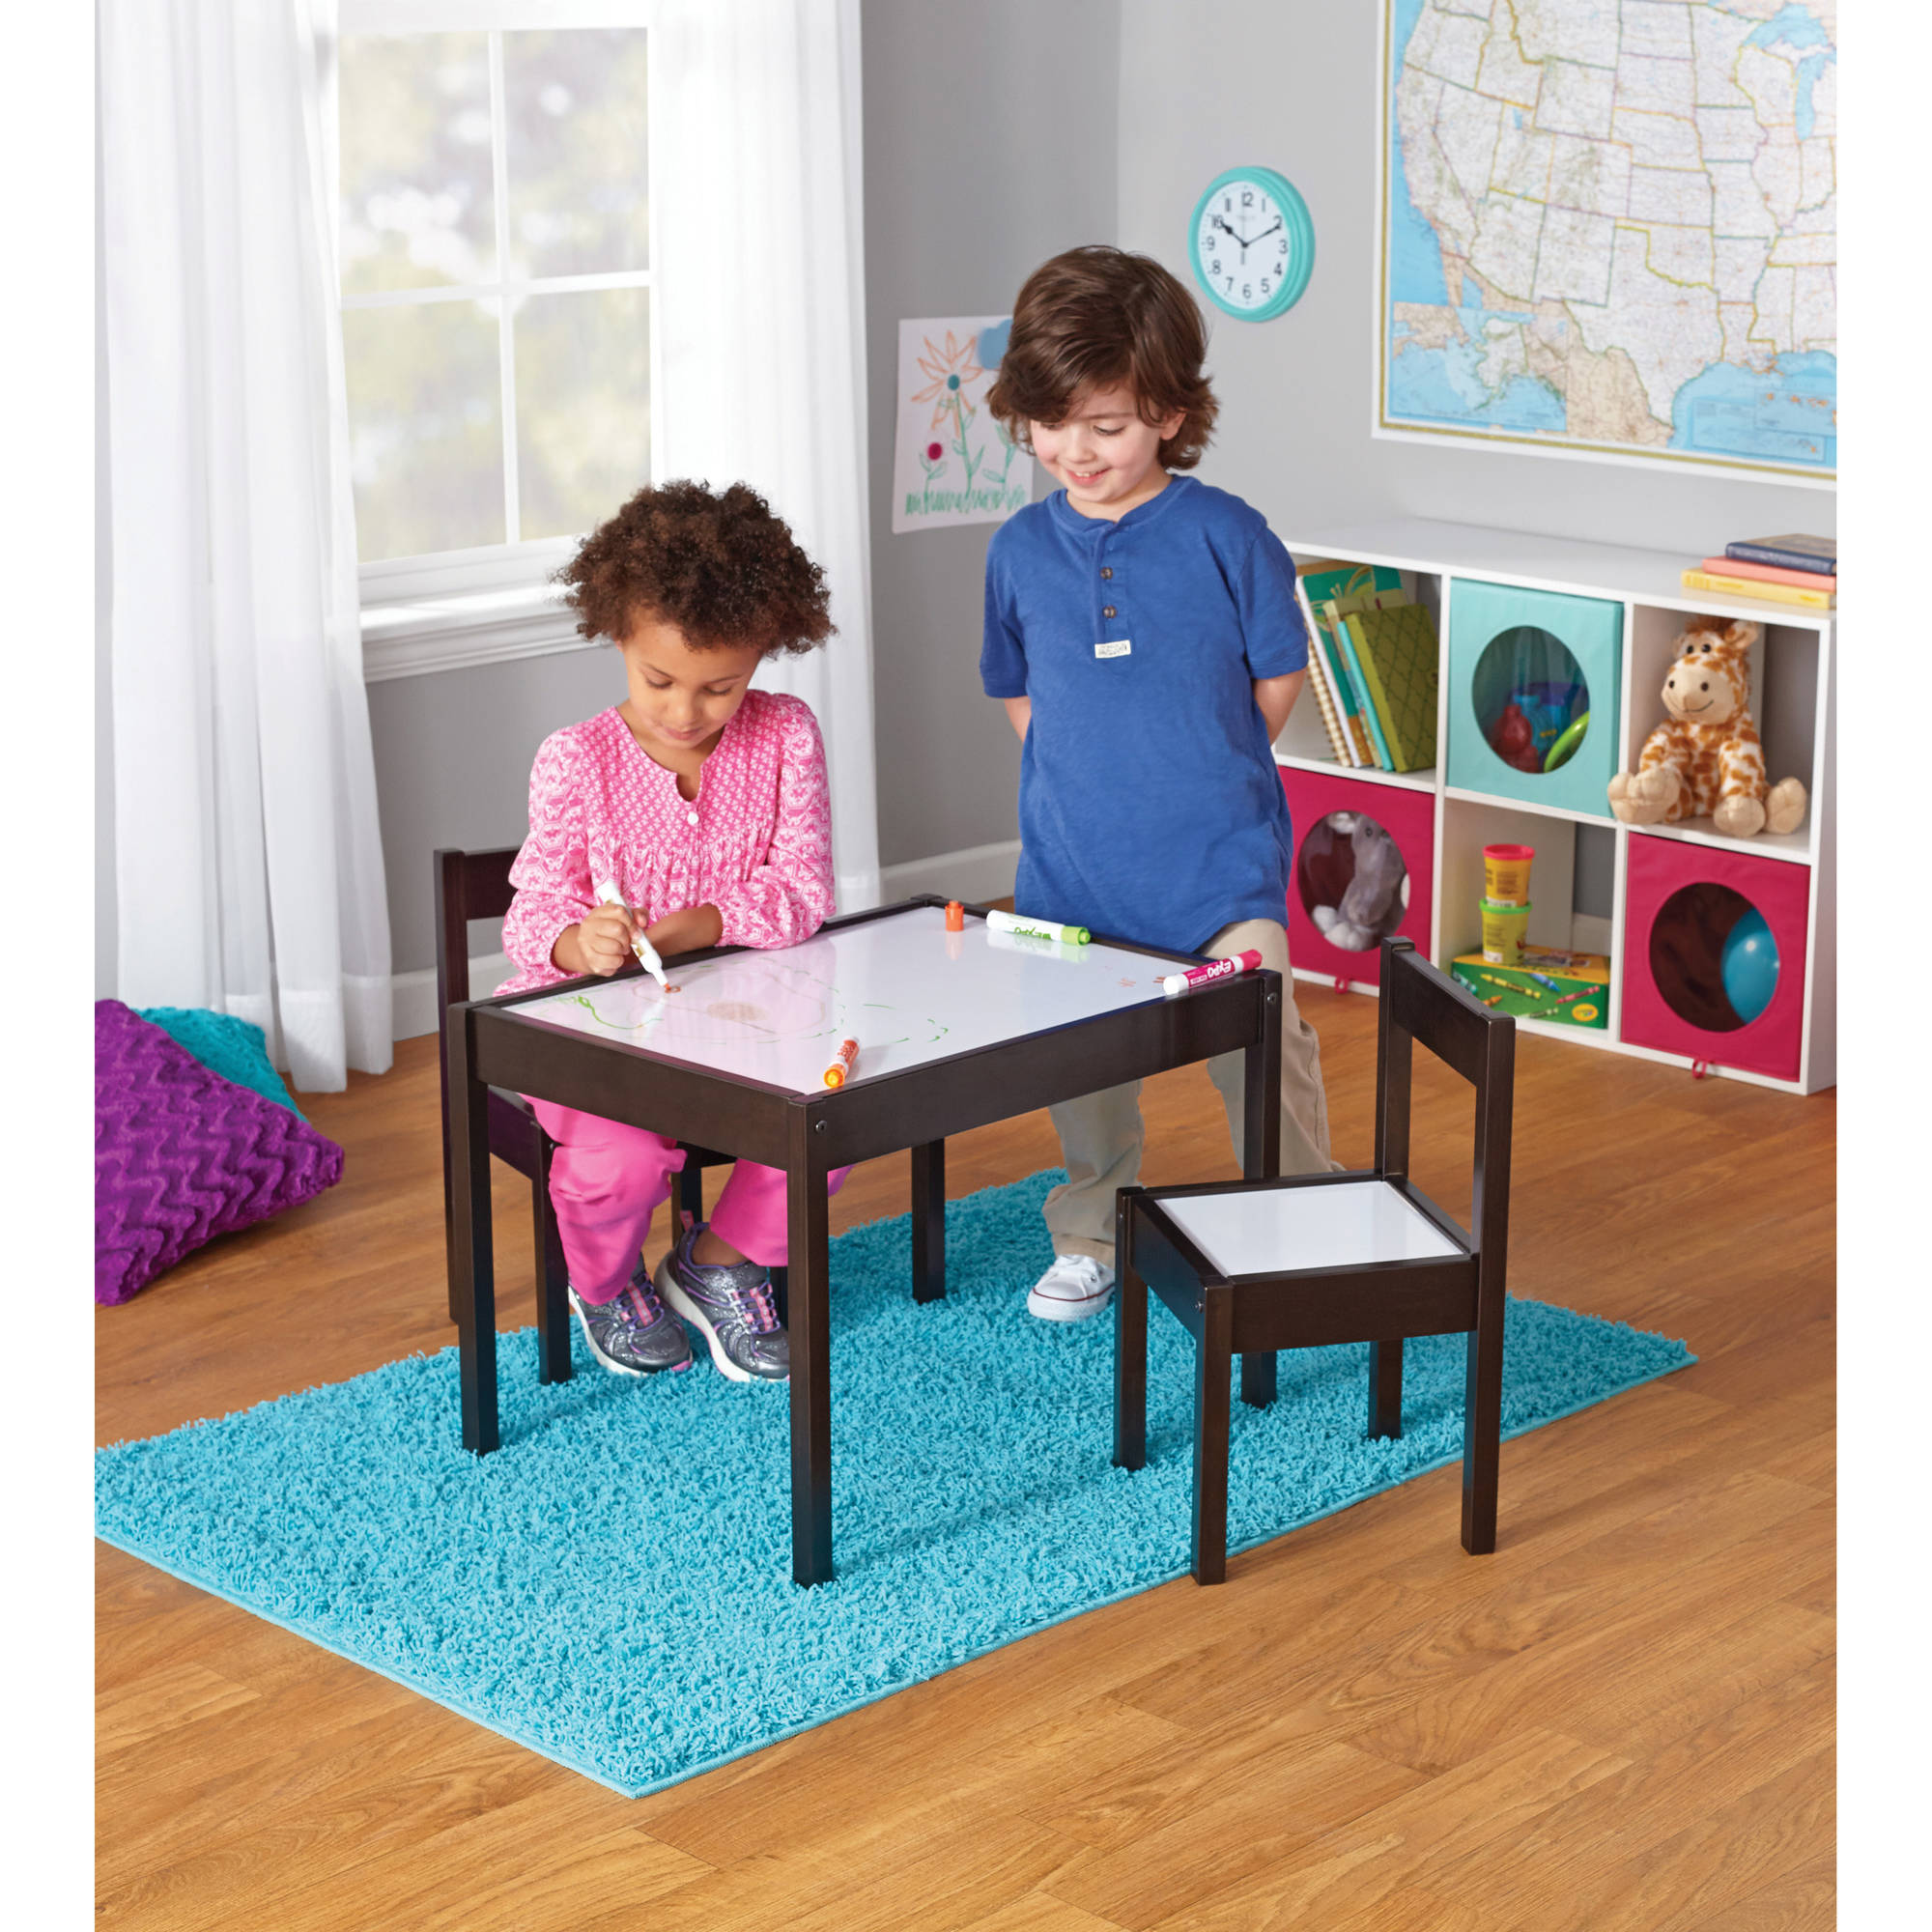 3 Piece Children S Table And Chairs Espresso Walmart Com